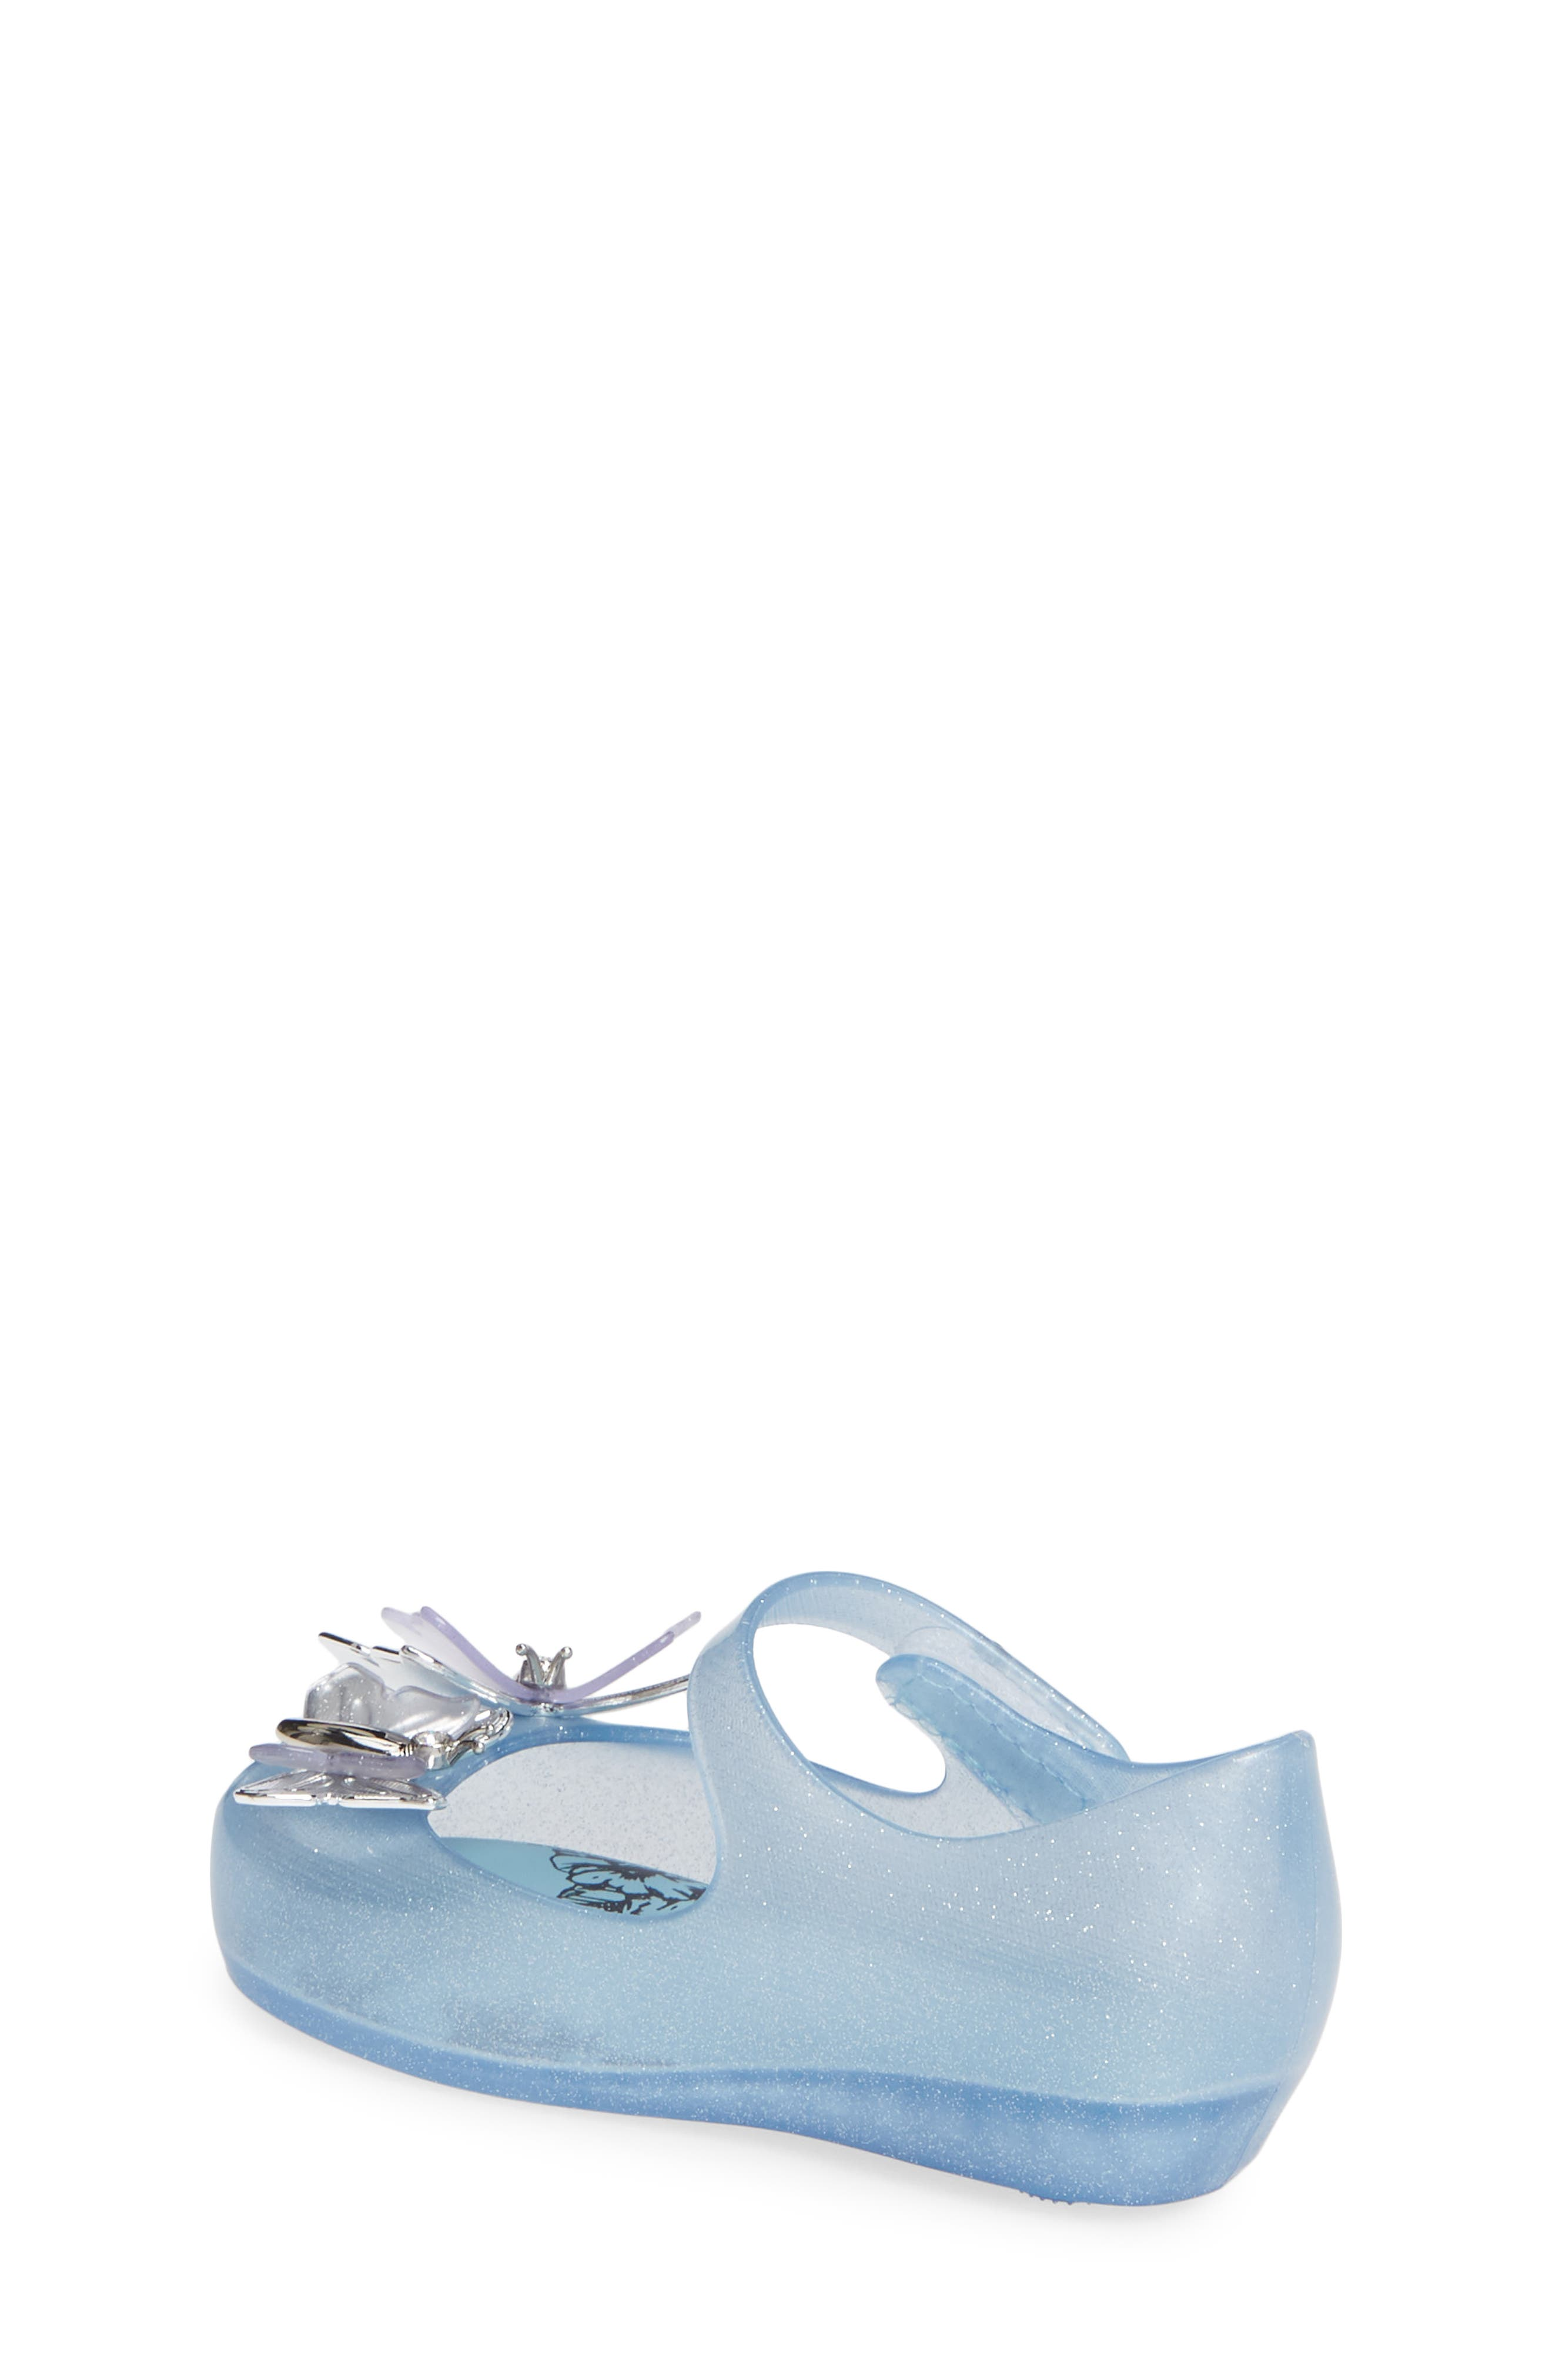 29cc7f9bab5 Mini Melissa Kids  Shoes